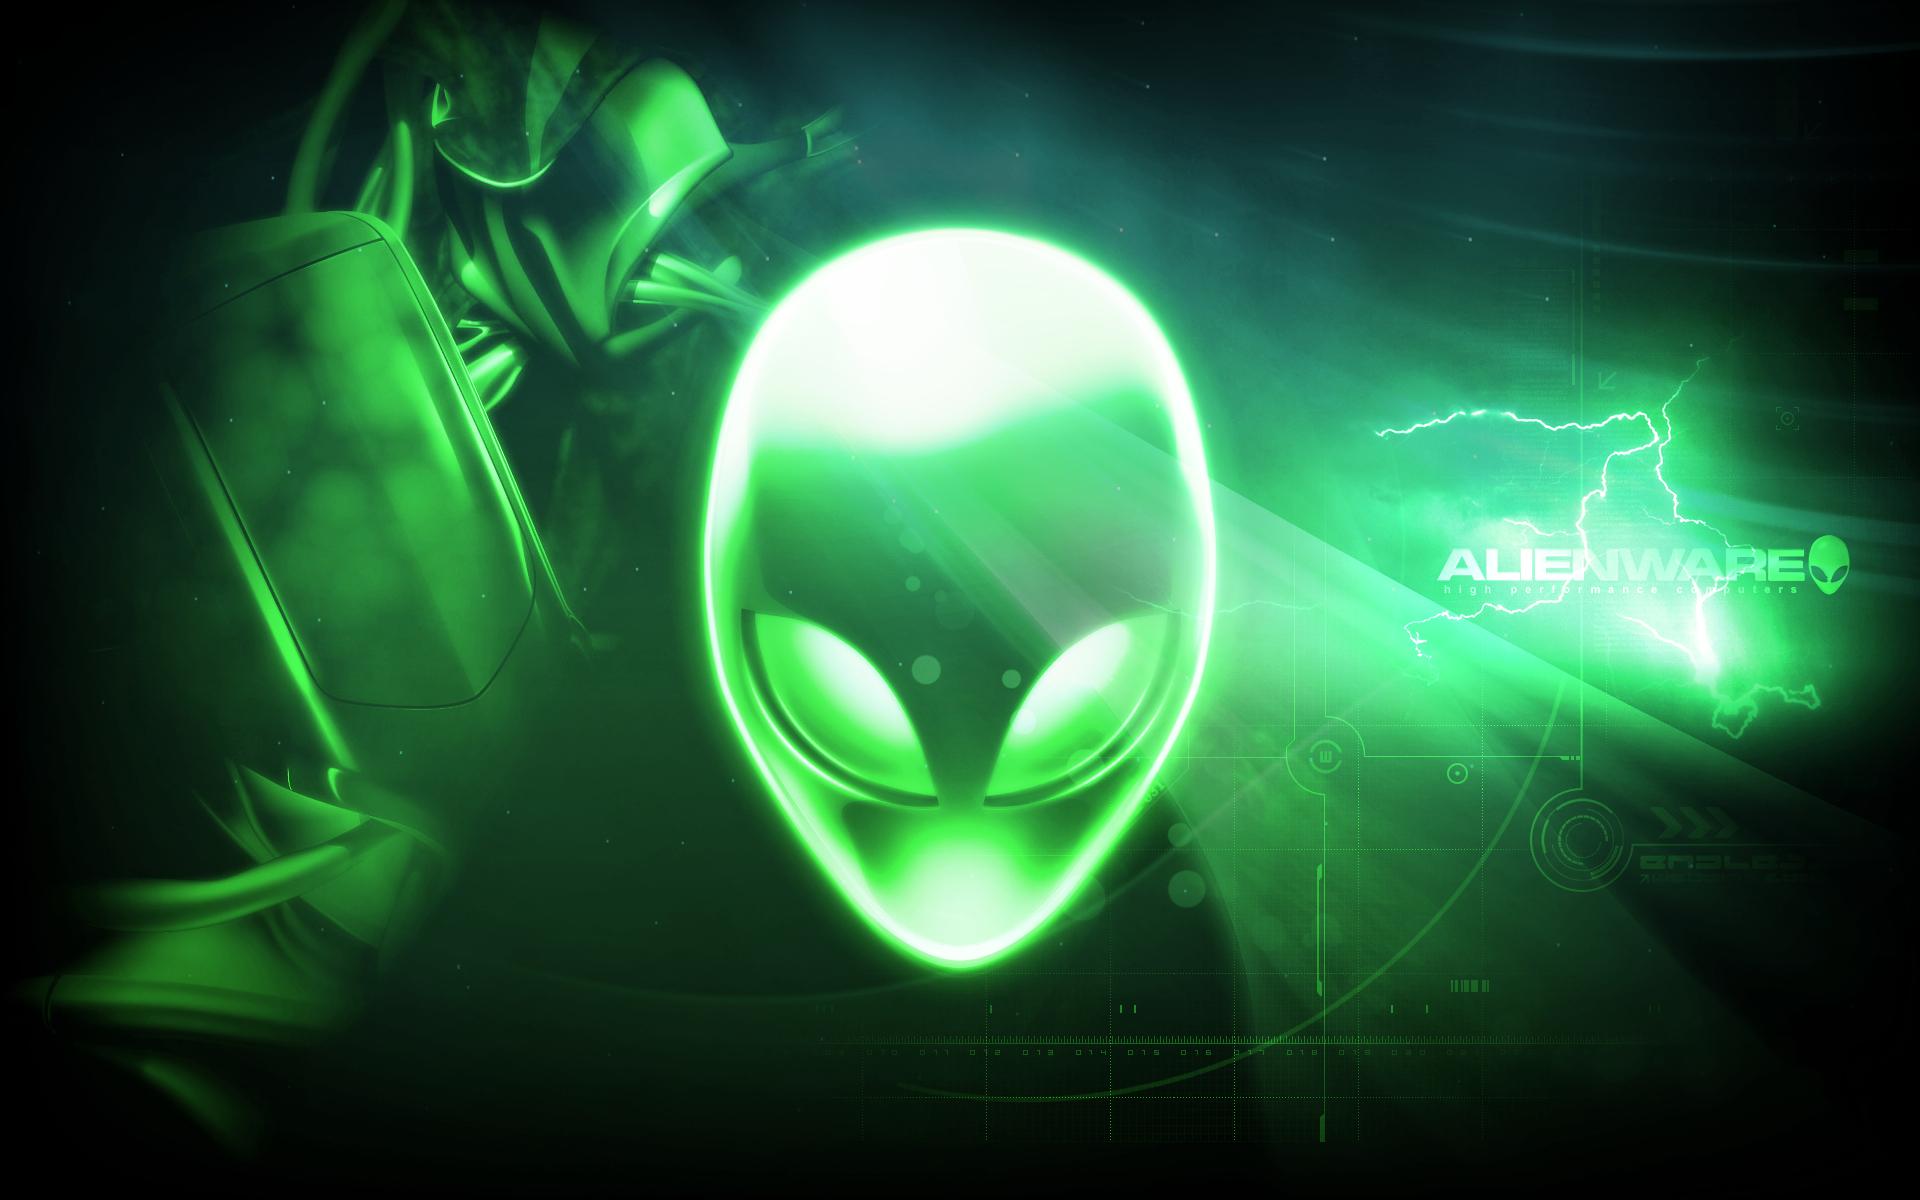 Desktops Promise Reloaded Alienware Desktop Green wallpapers HD 1920x1200